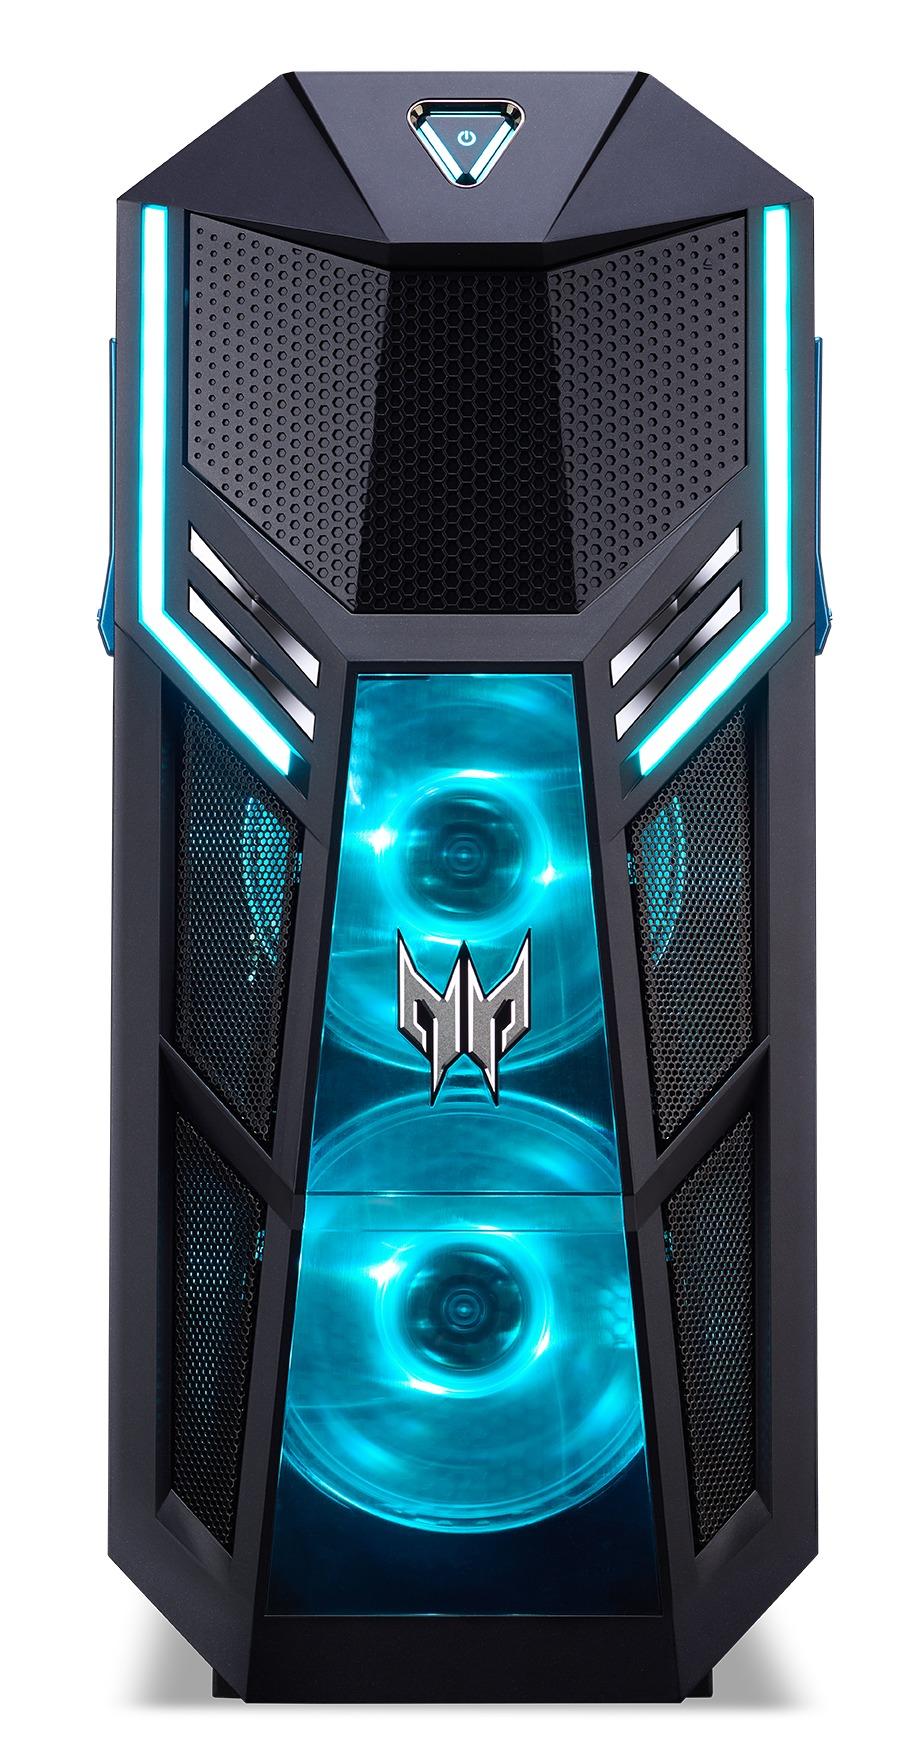 Korting Acer Predator Orion 5000 605s I9104 desktop